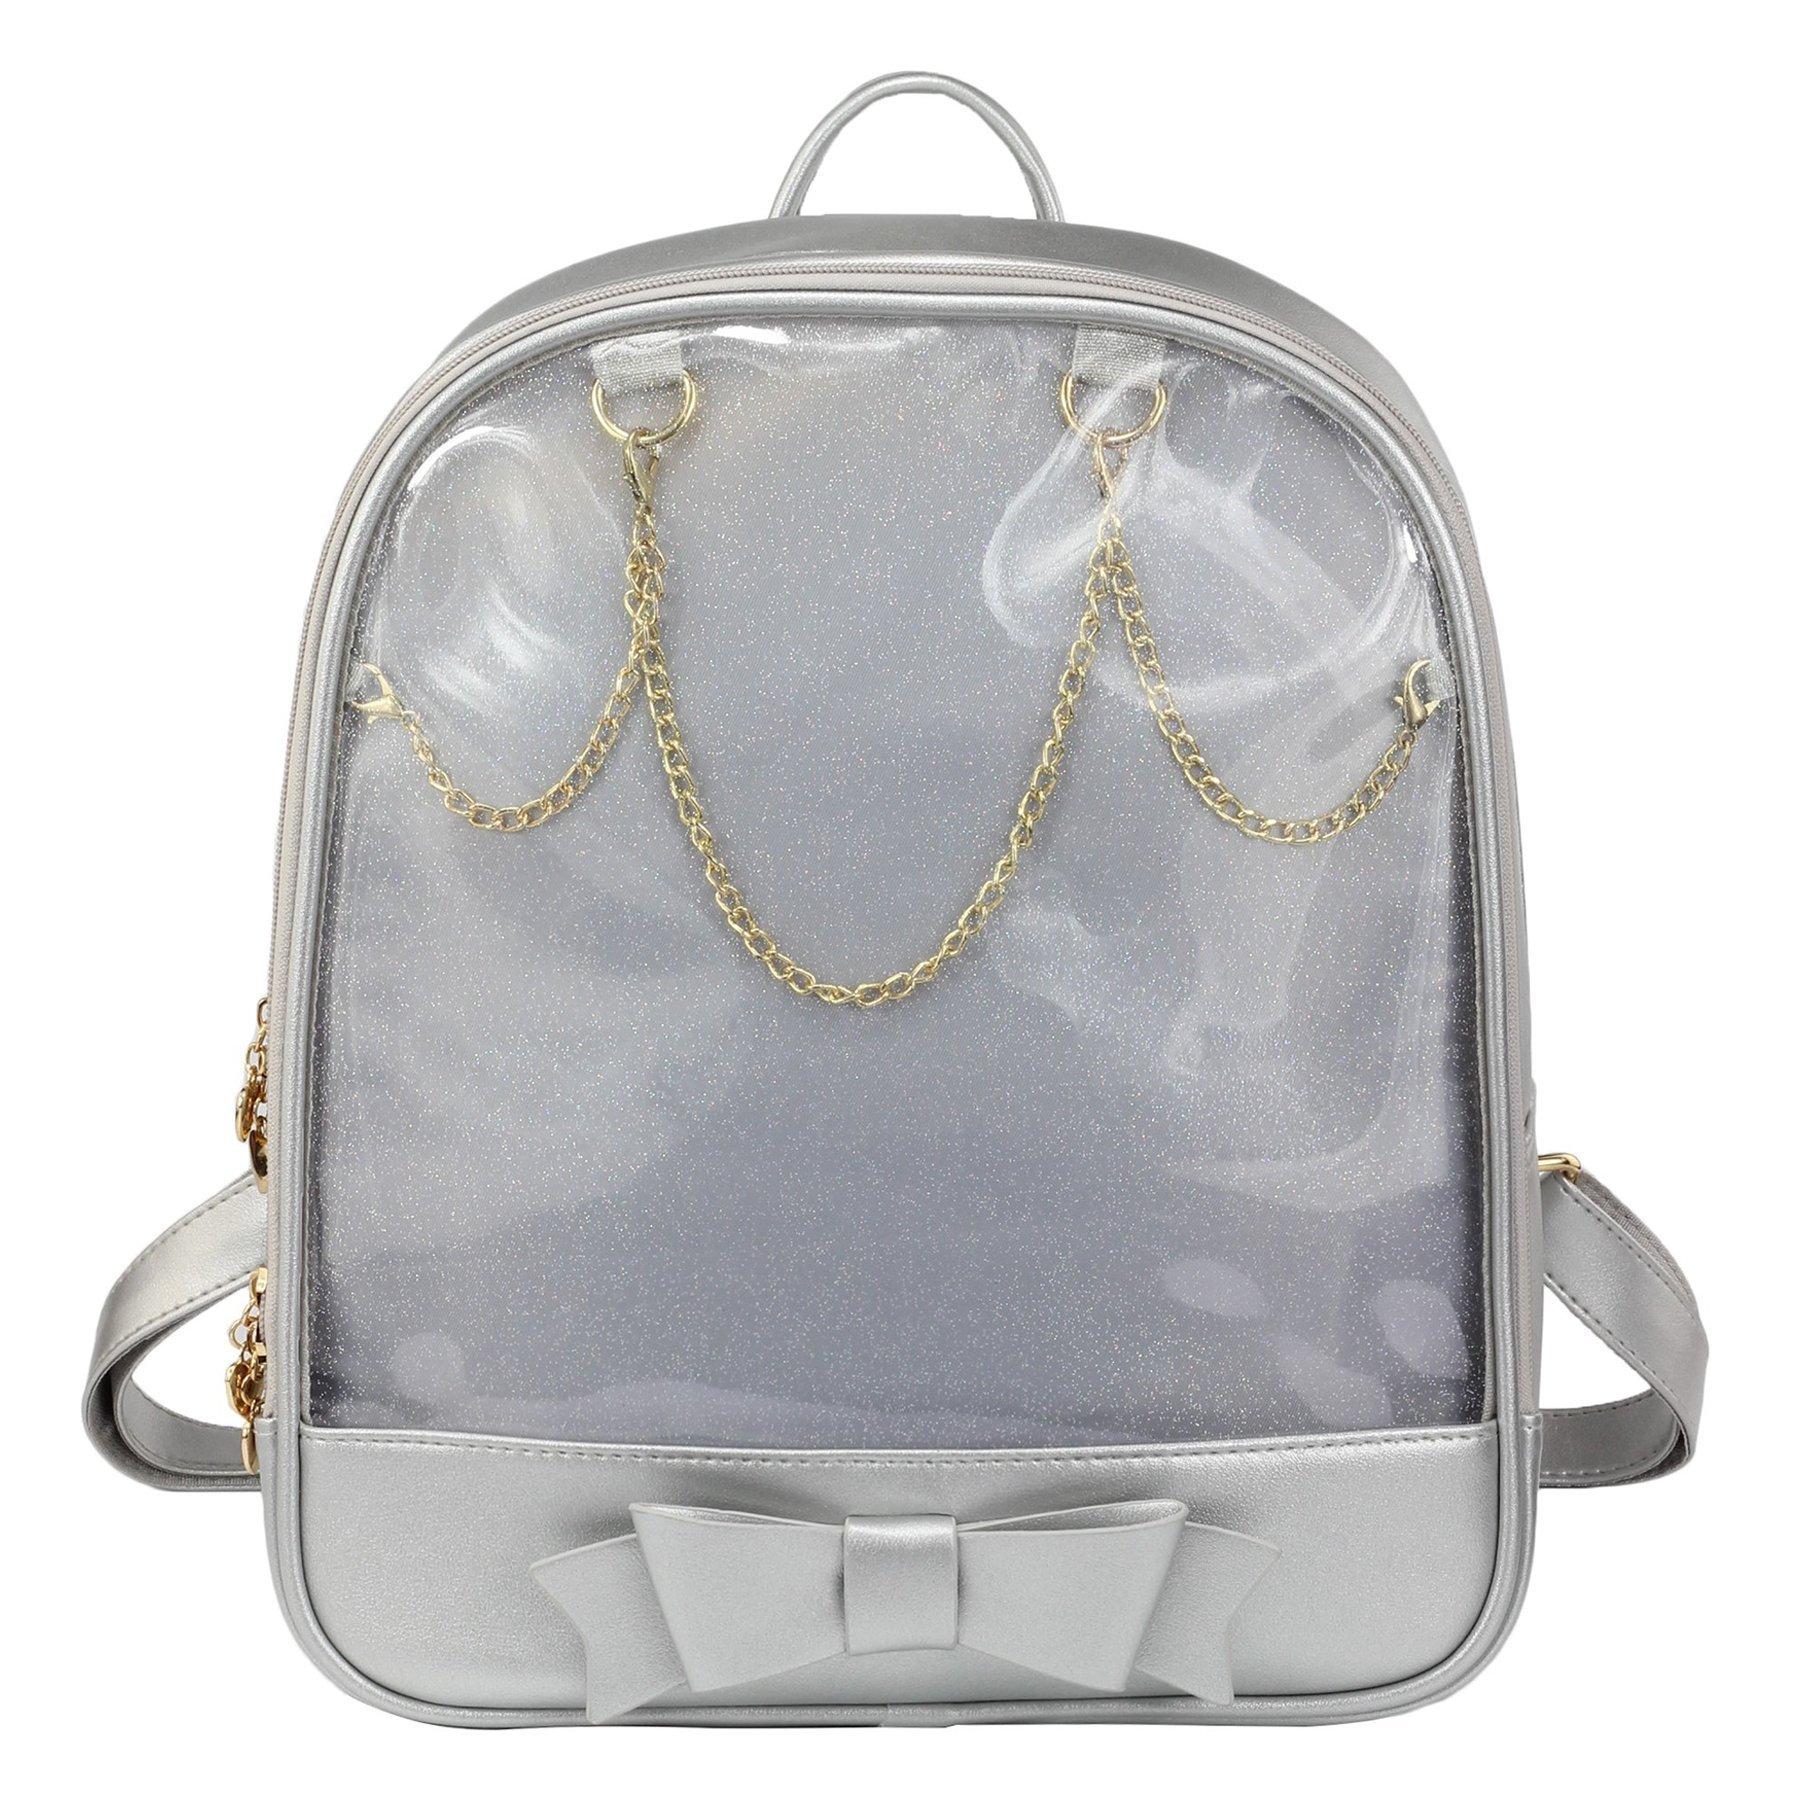 SteamedBun Ita Bag Candy Leather Backpack Bowknot Transparent Beach Girls School Bag Silver